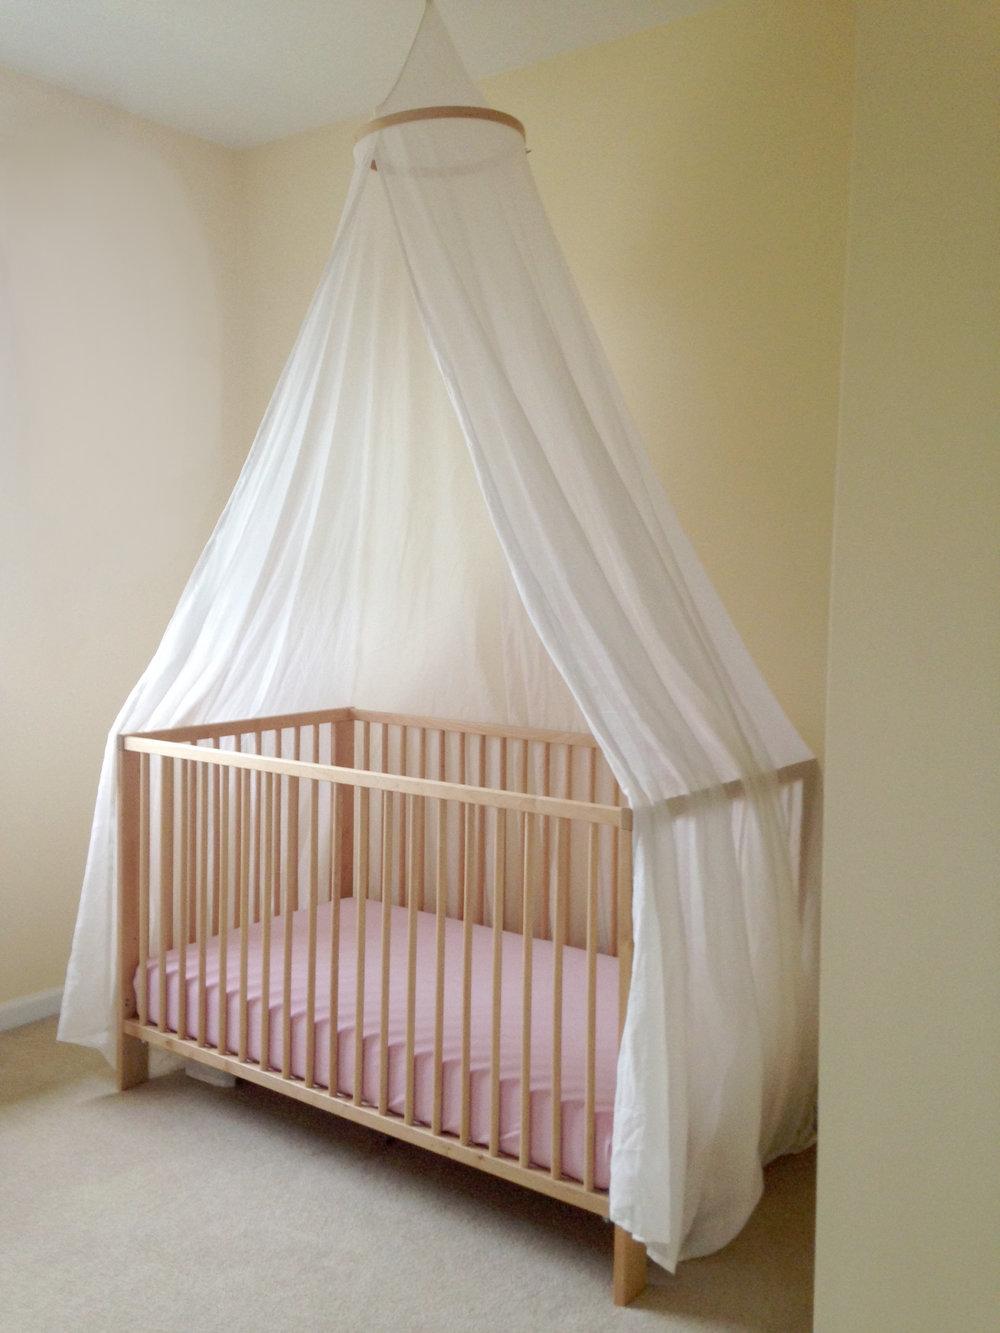 HealthyHouse™ Baby Crib Canopy - RF Shielding & HealthyHouse™ Baby Crib Canopy - RF Shielding u2014 Healthy House